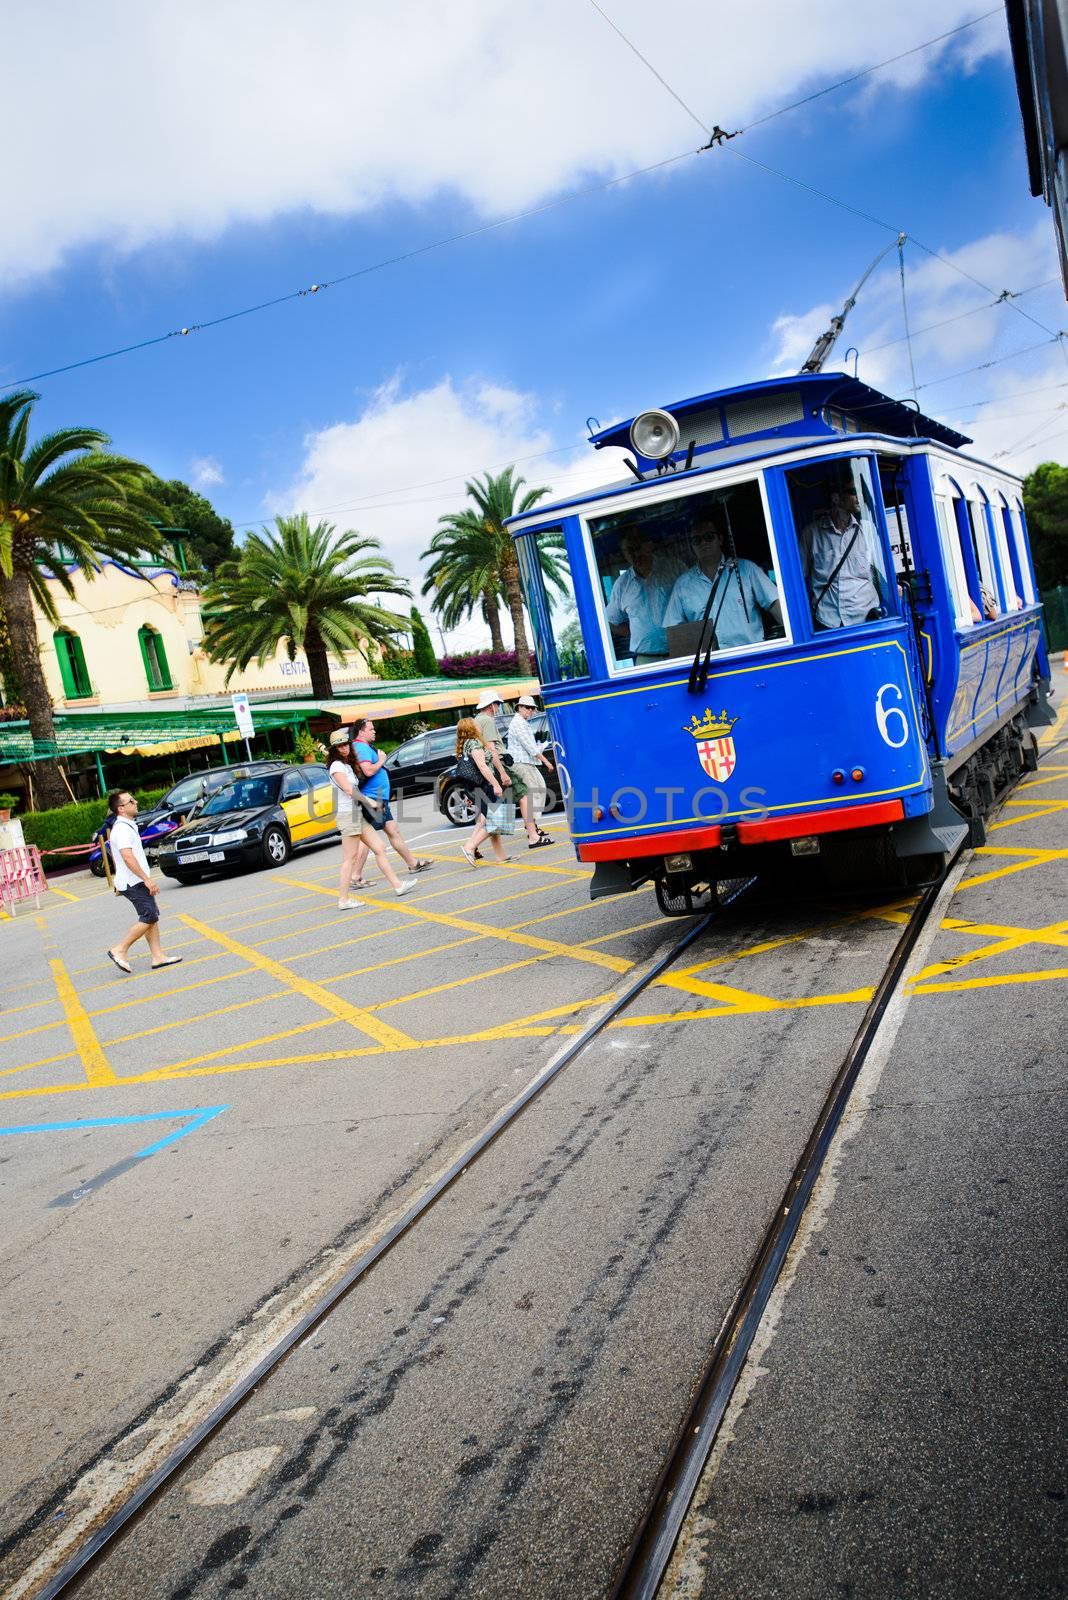 BARCELONA - JULY 13: Nostalgic Blue Tram to Tibidabo July 13, 2012 in Barcelona, Spain.